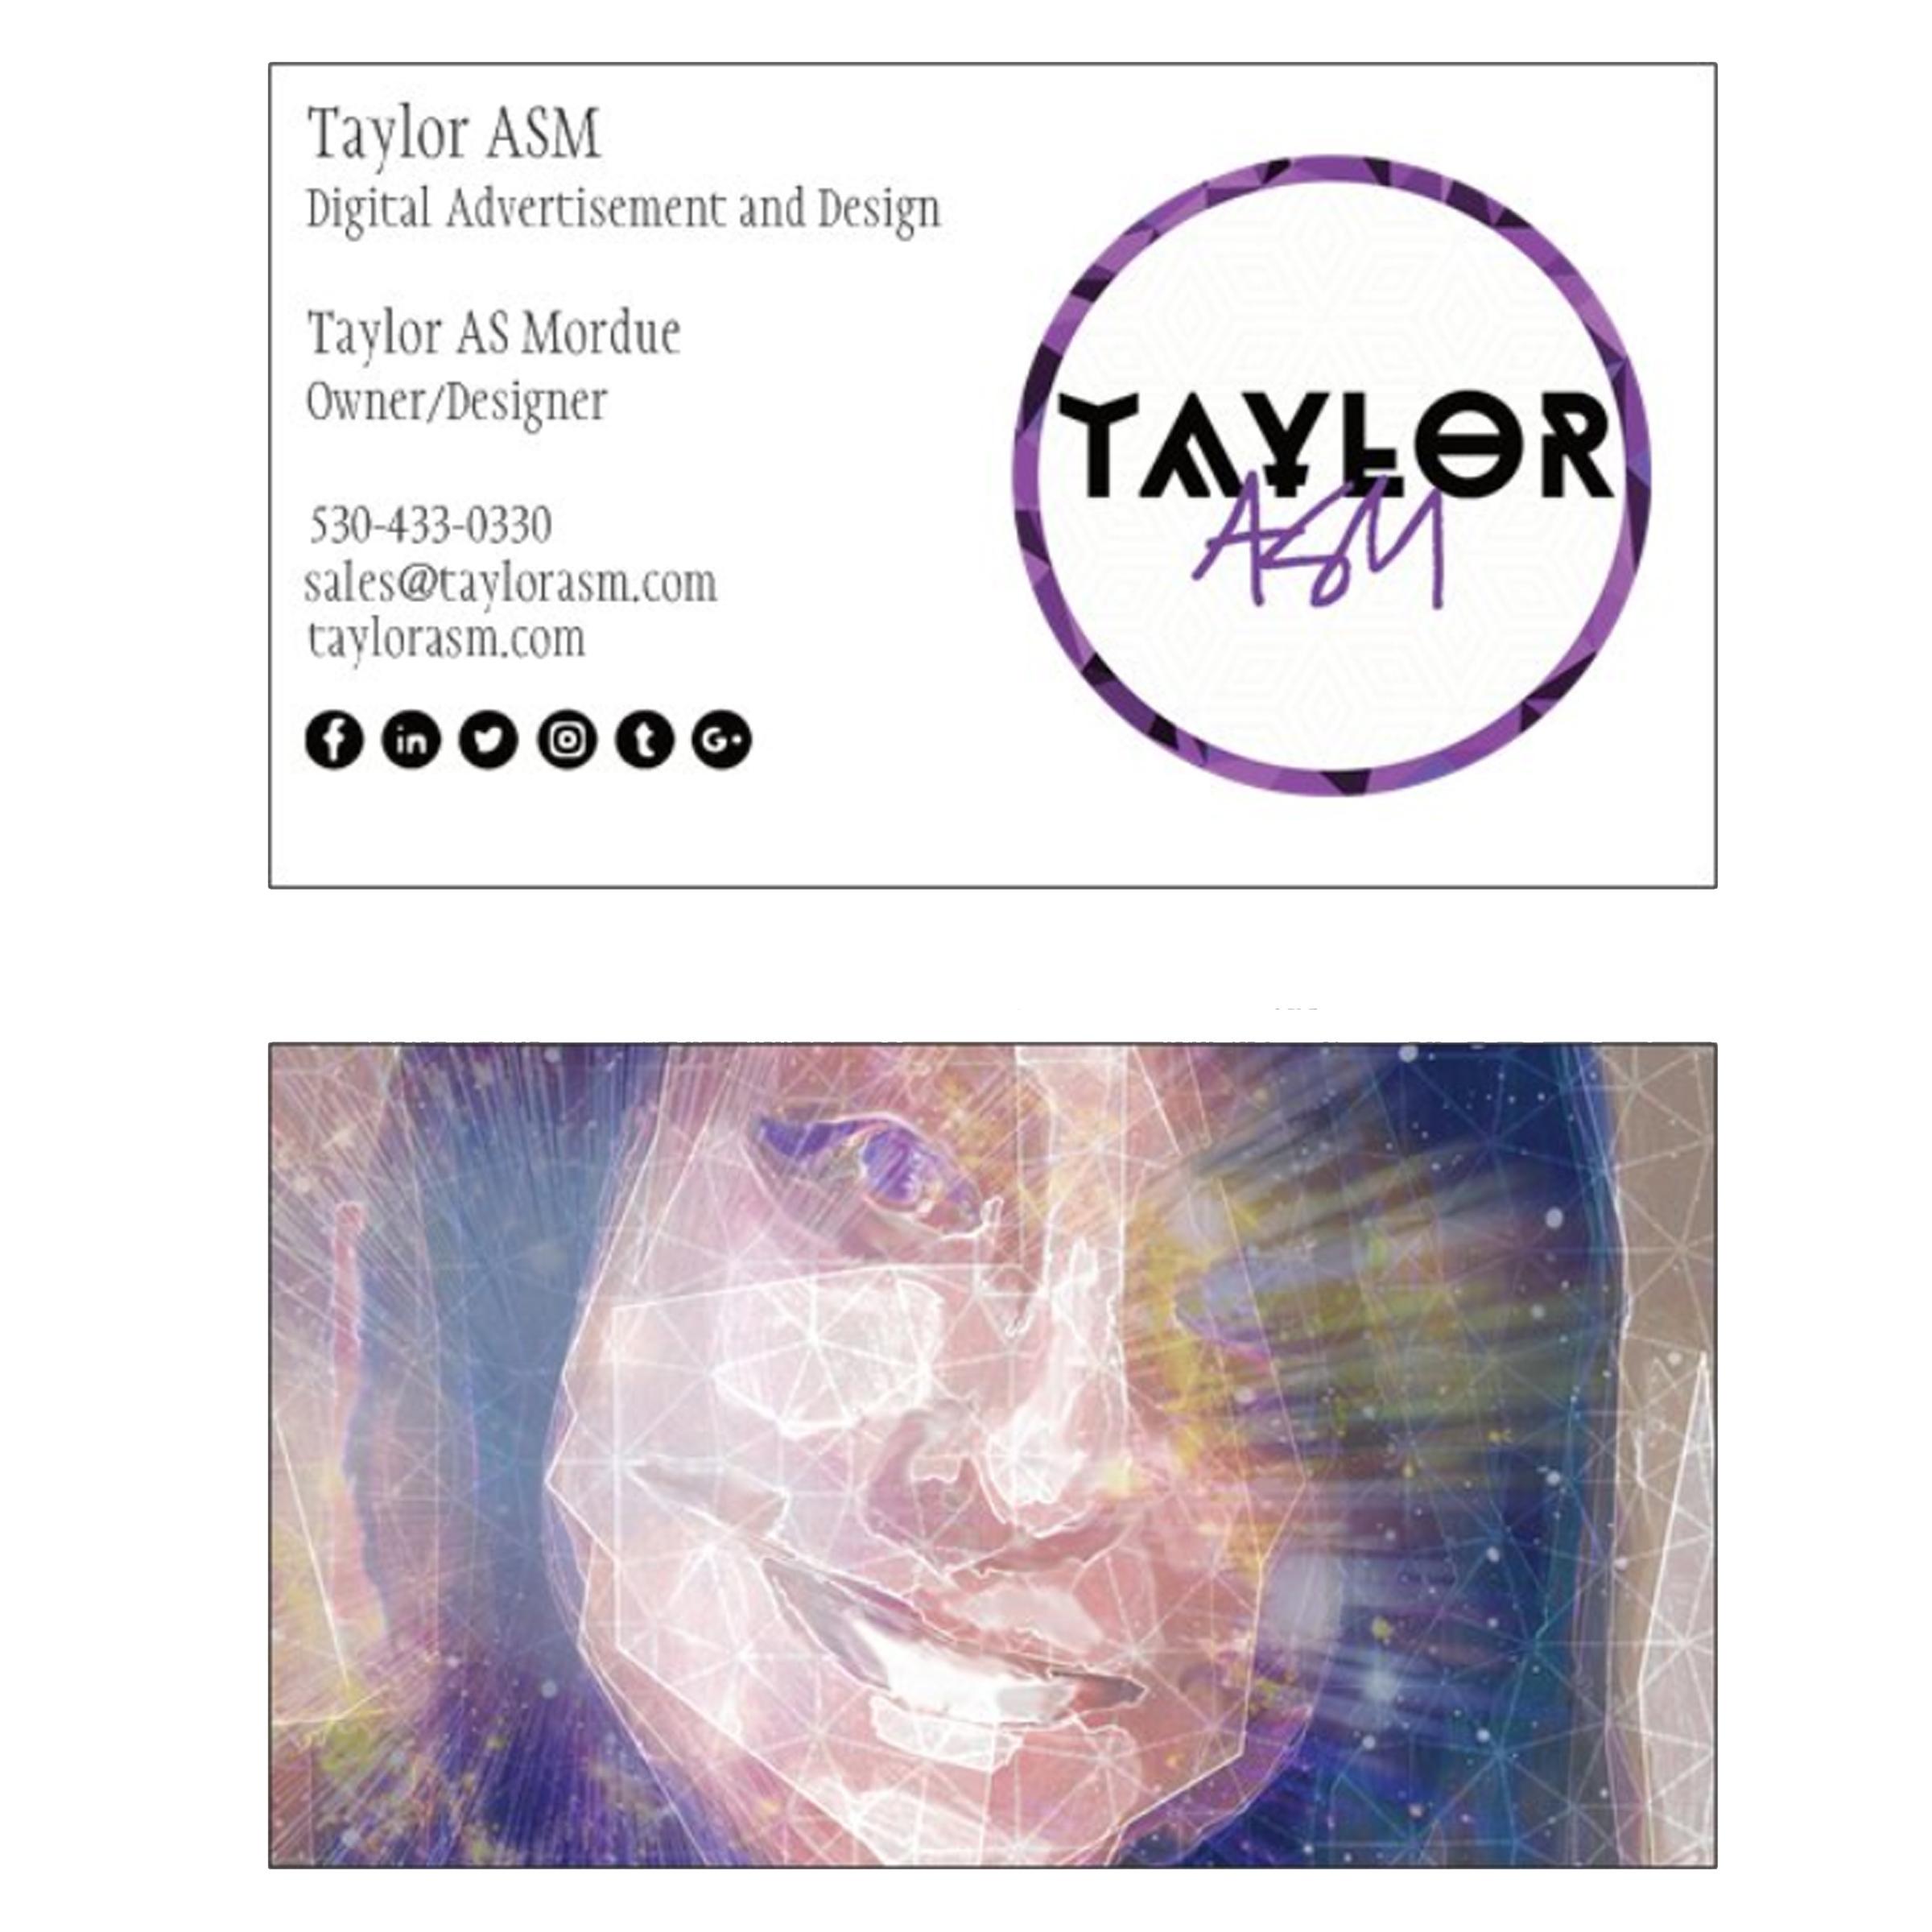 Taylor ASM businesscards